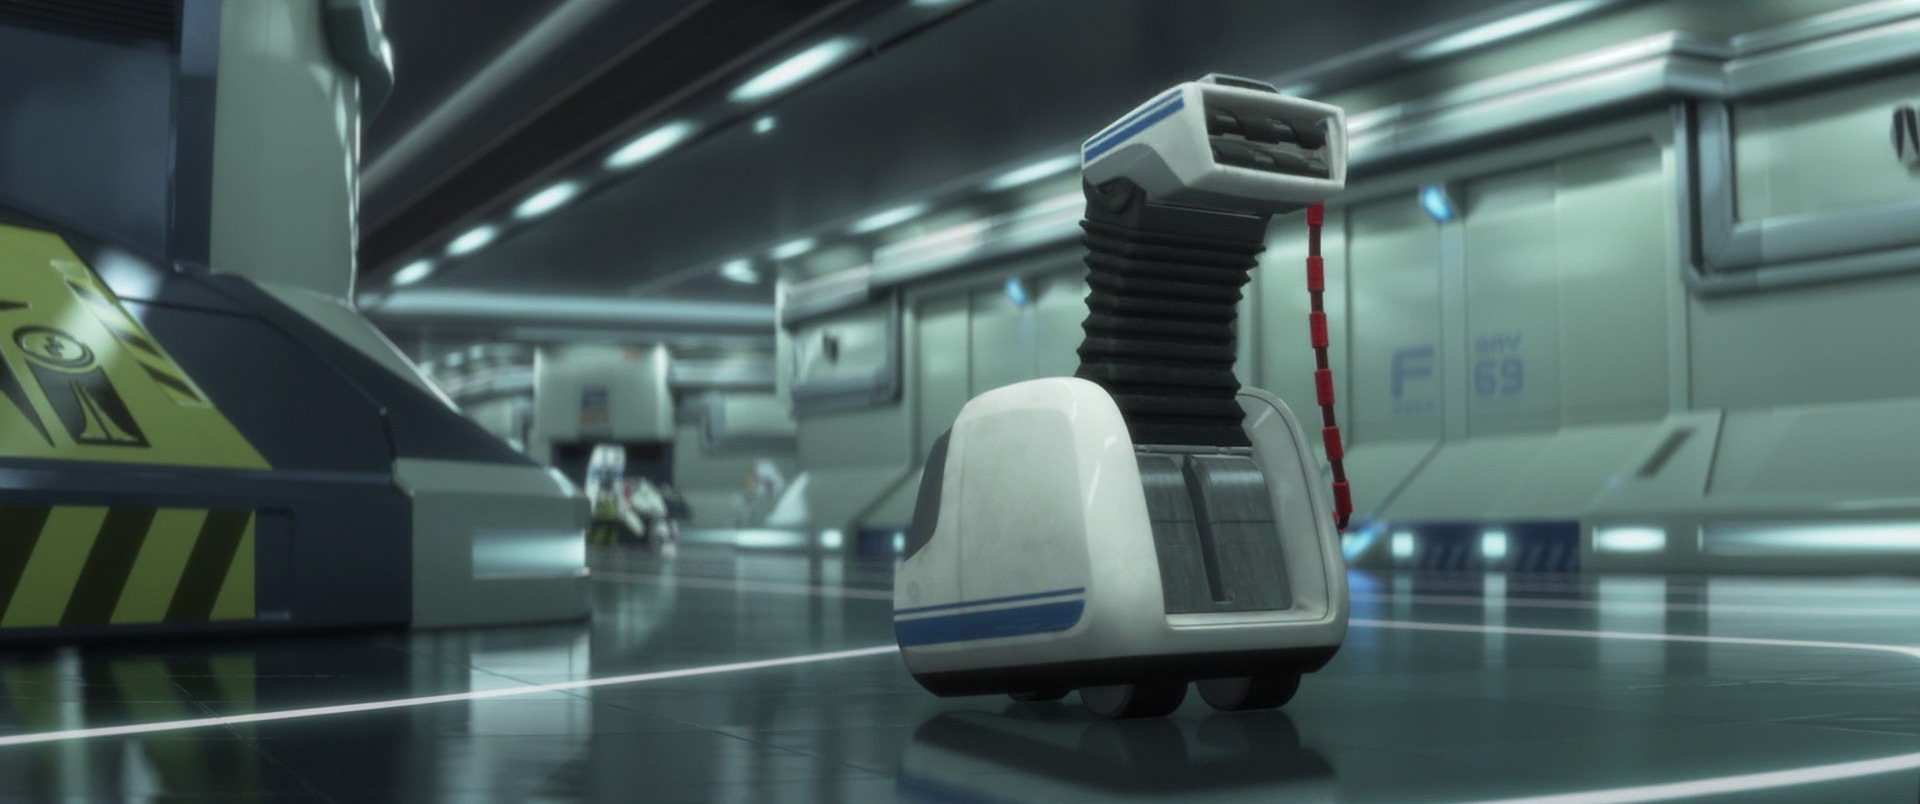 vaq m personnage dans wall e pixar planet fr. Black Bedroom Furniture Sets. Home Design Ideas